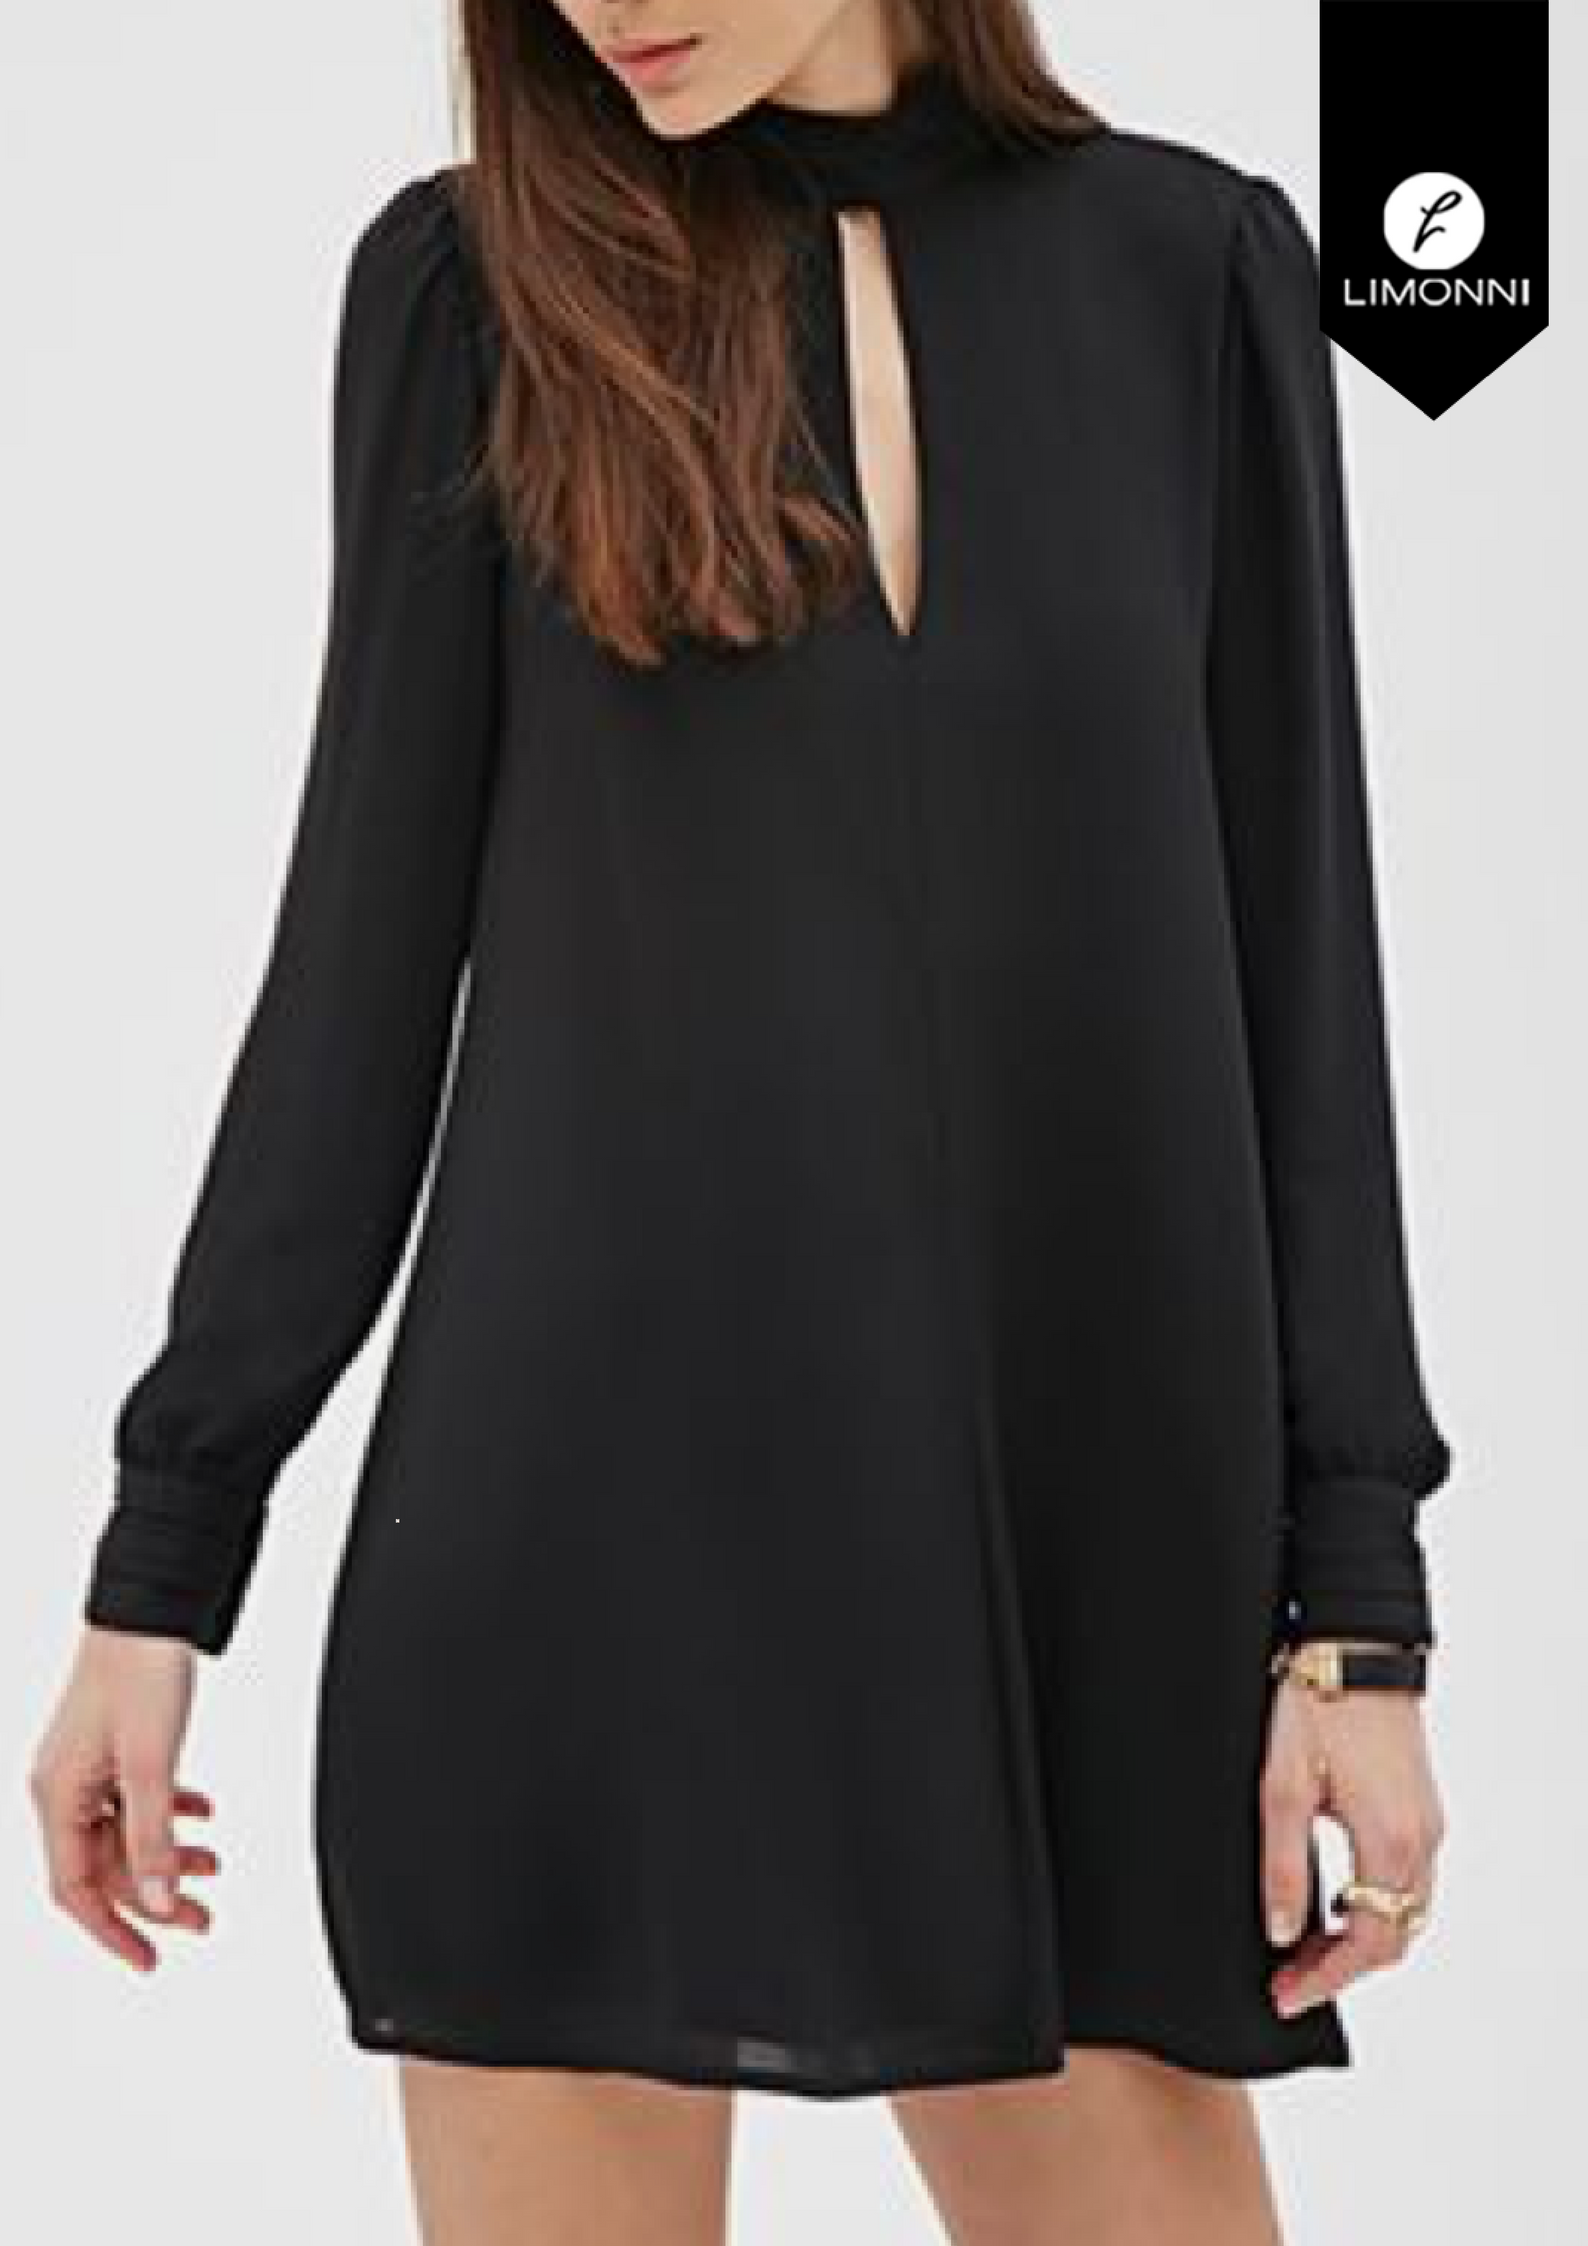 Vestidos para mujer Limonni Bennett LI1355 Cortos elegantes